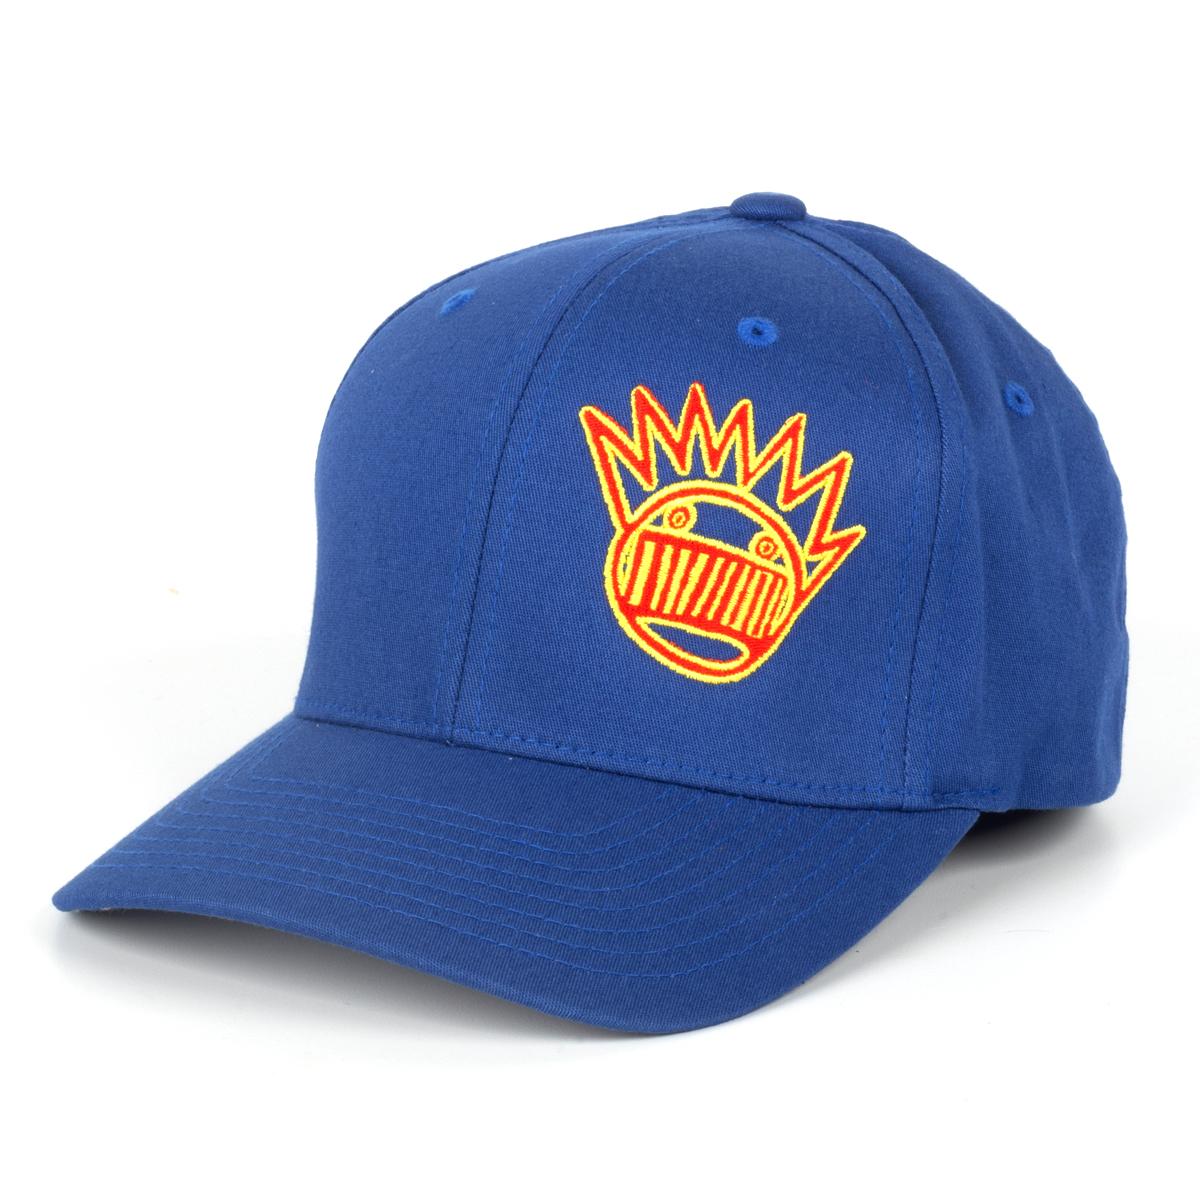 Boognish Blue Hat